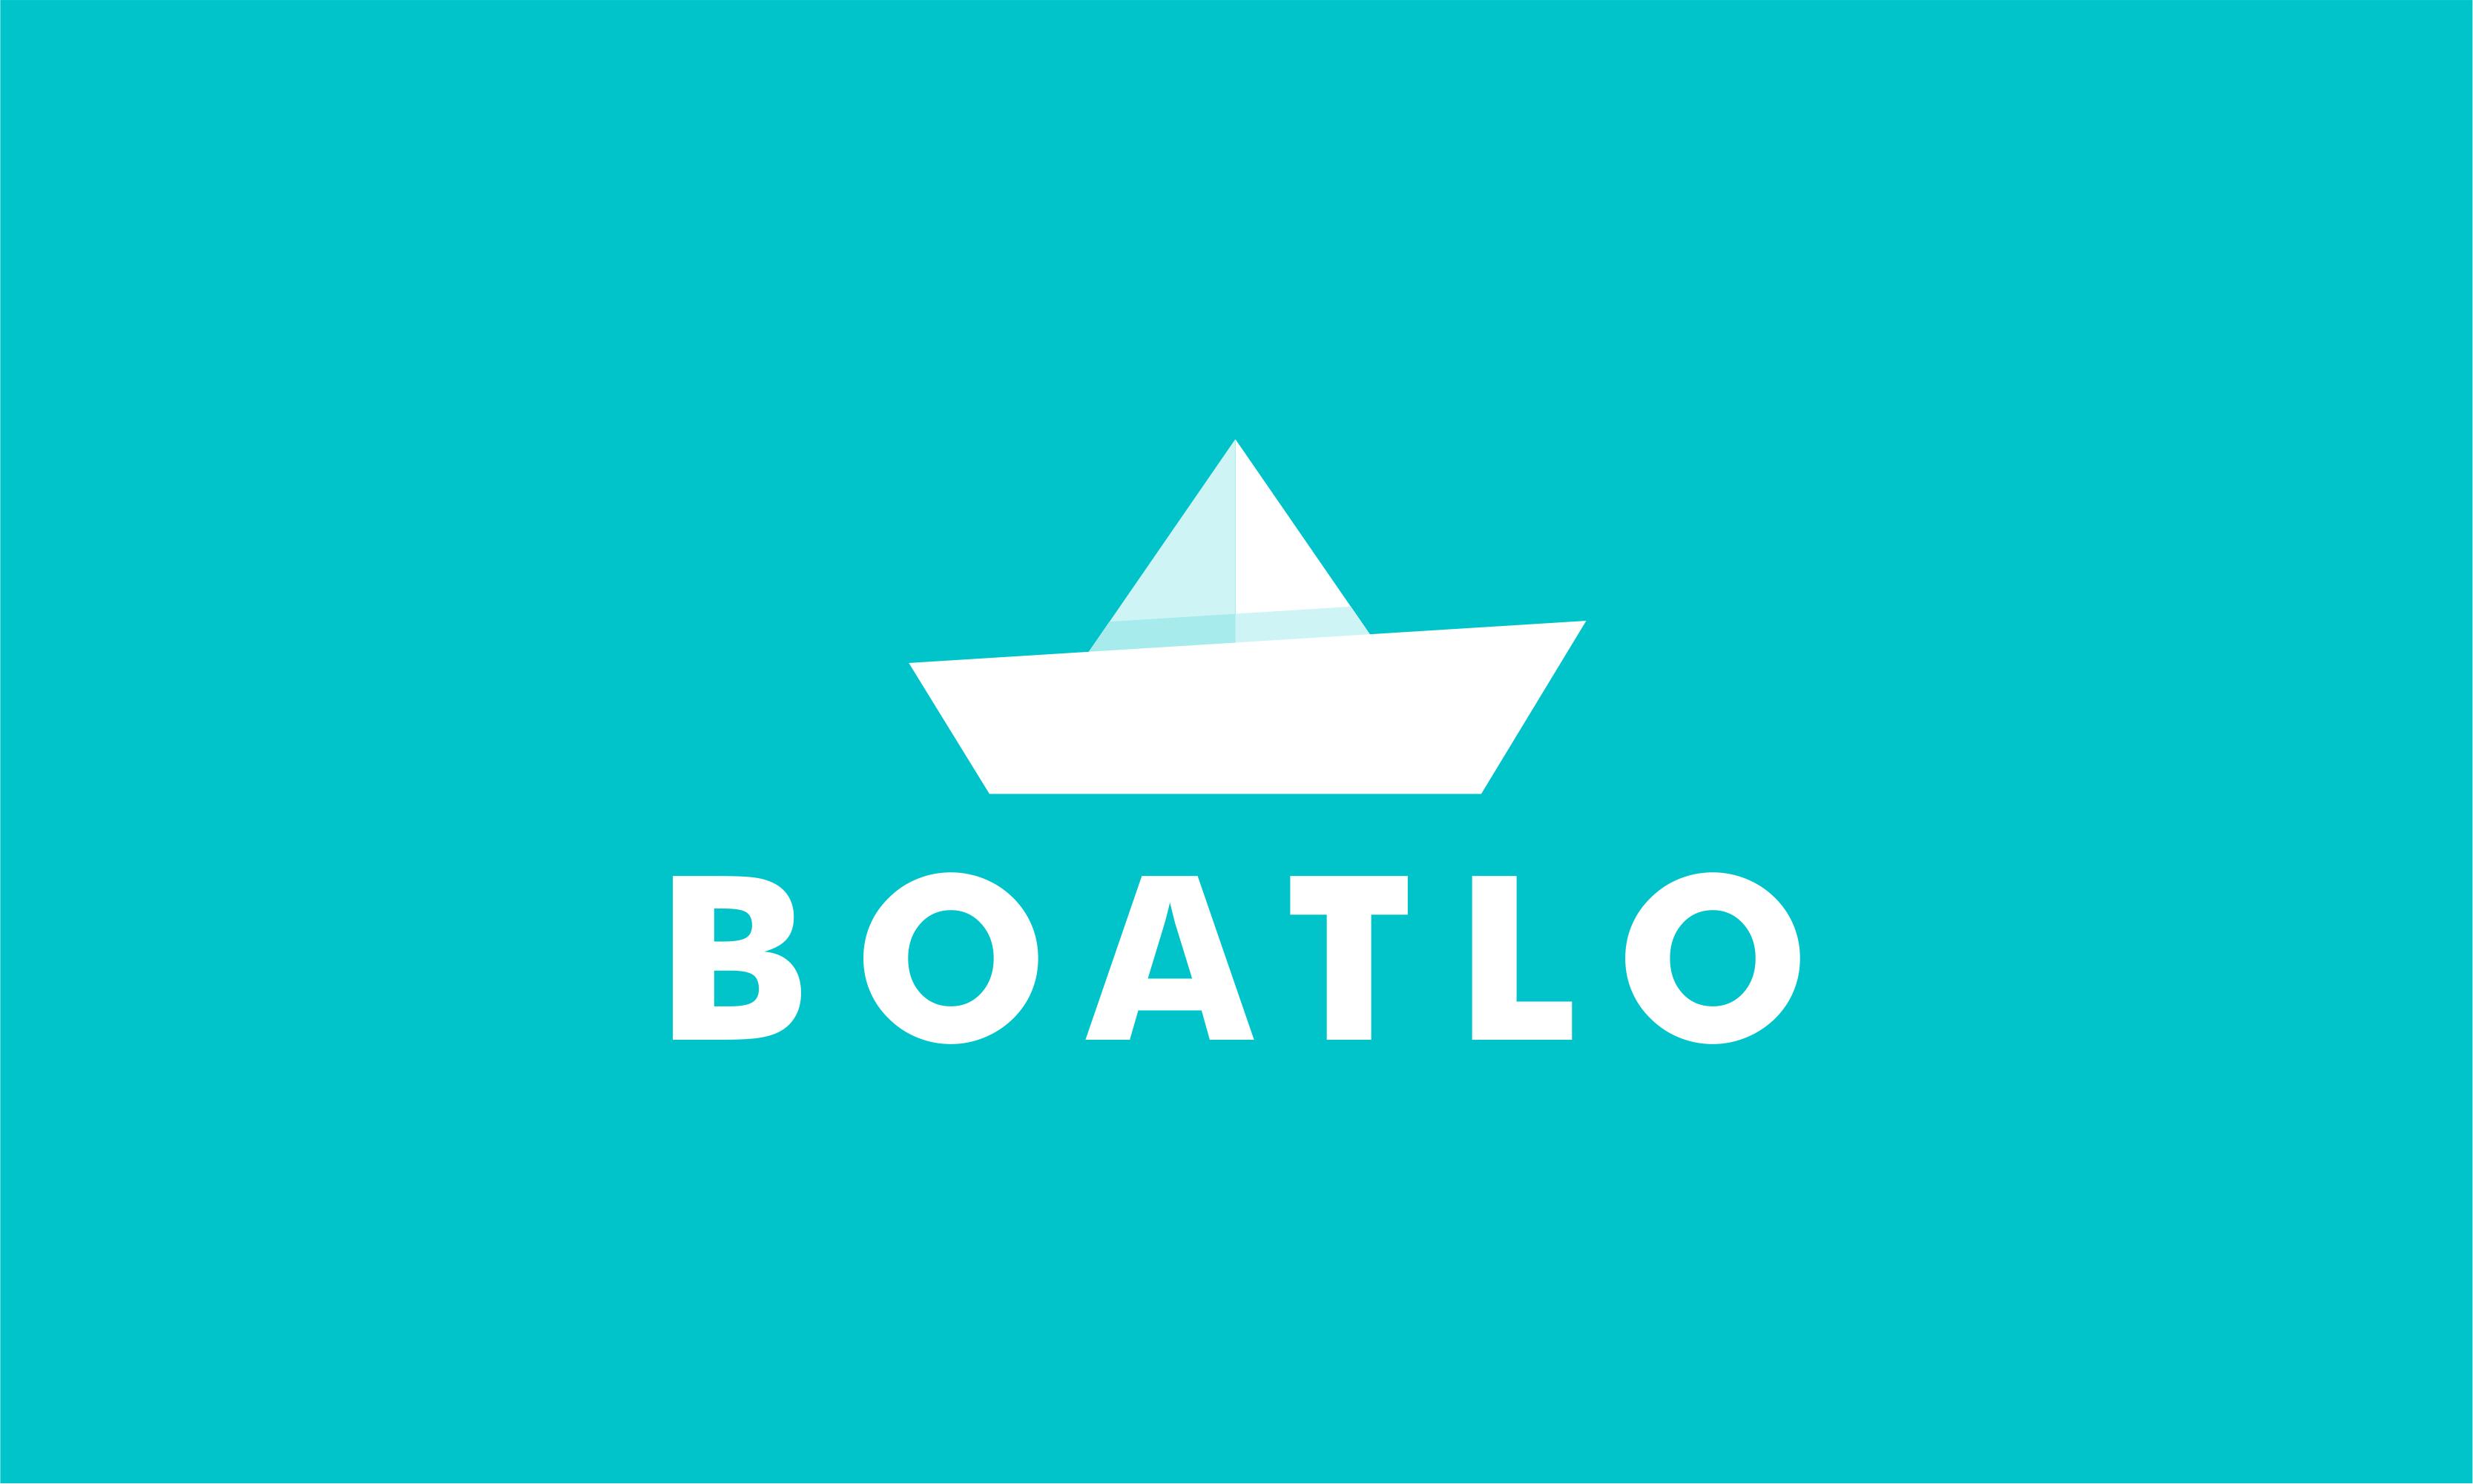 Boatlo - Naval startup name for sale